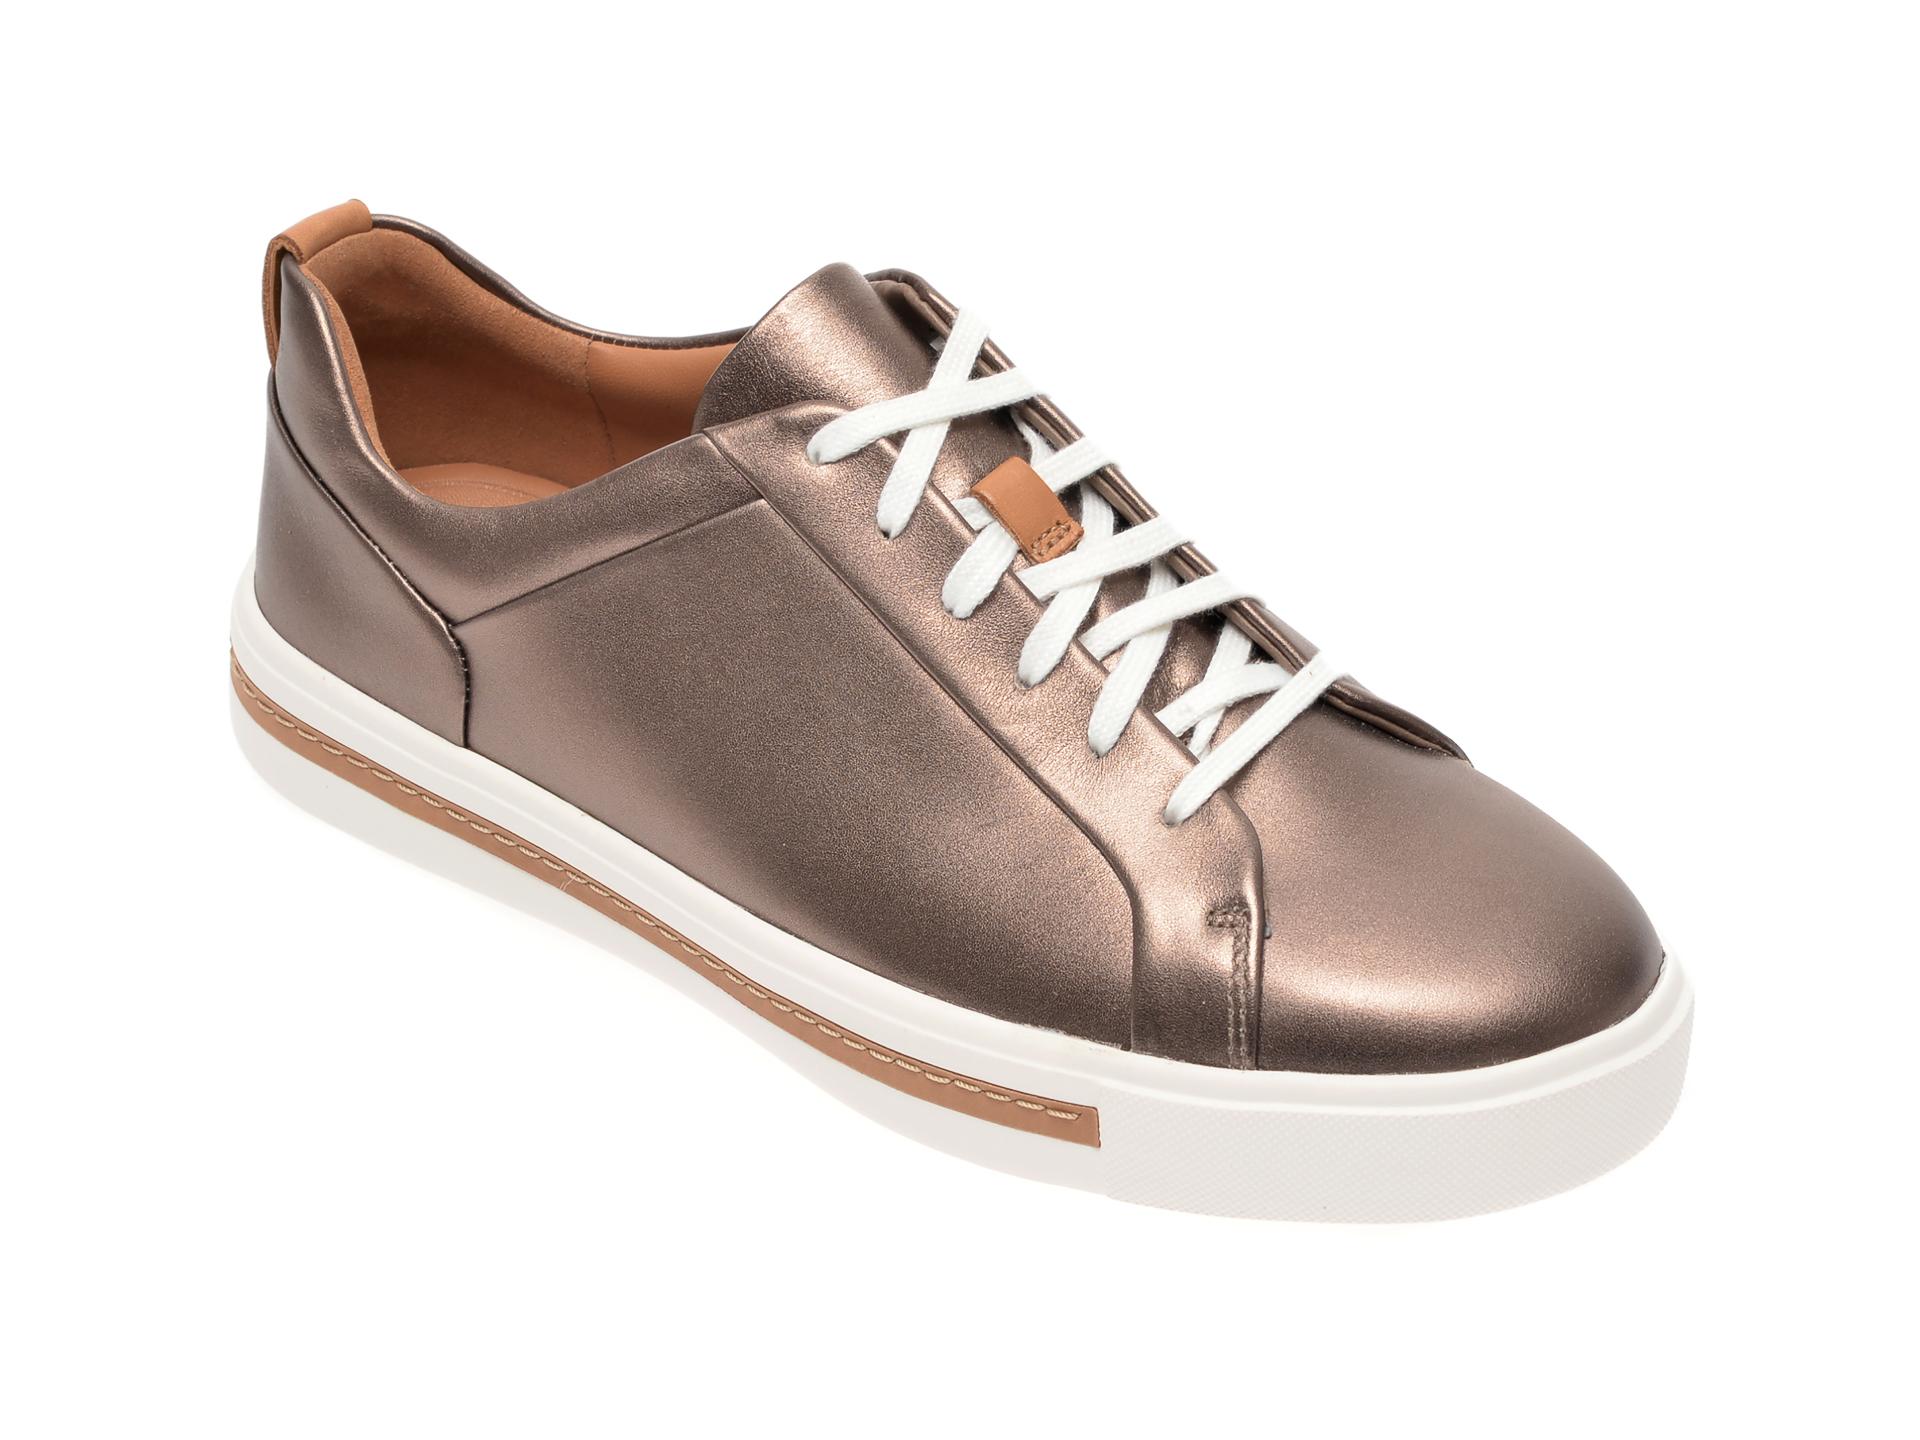 Pantofi CLARKS bronz, Un Maui Lace, din piele naturala